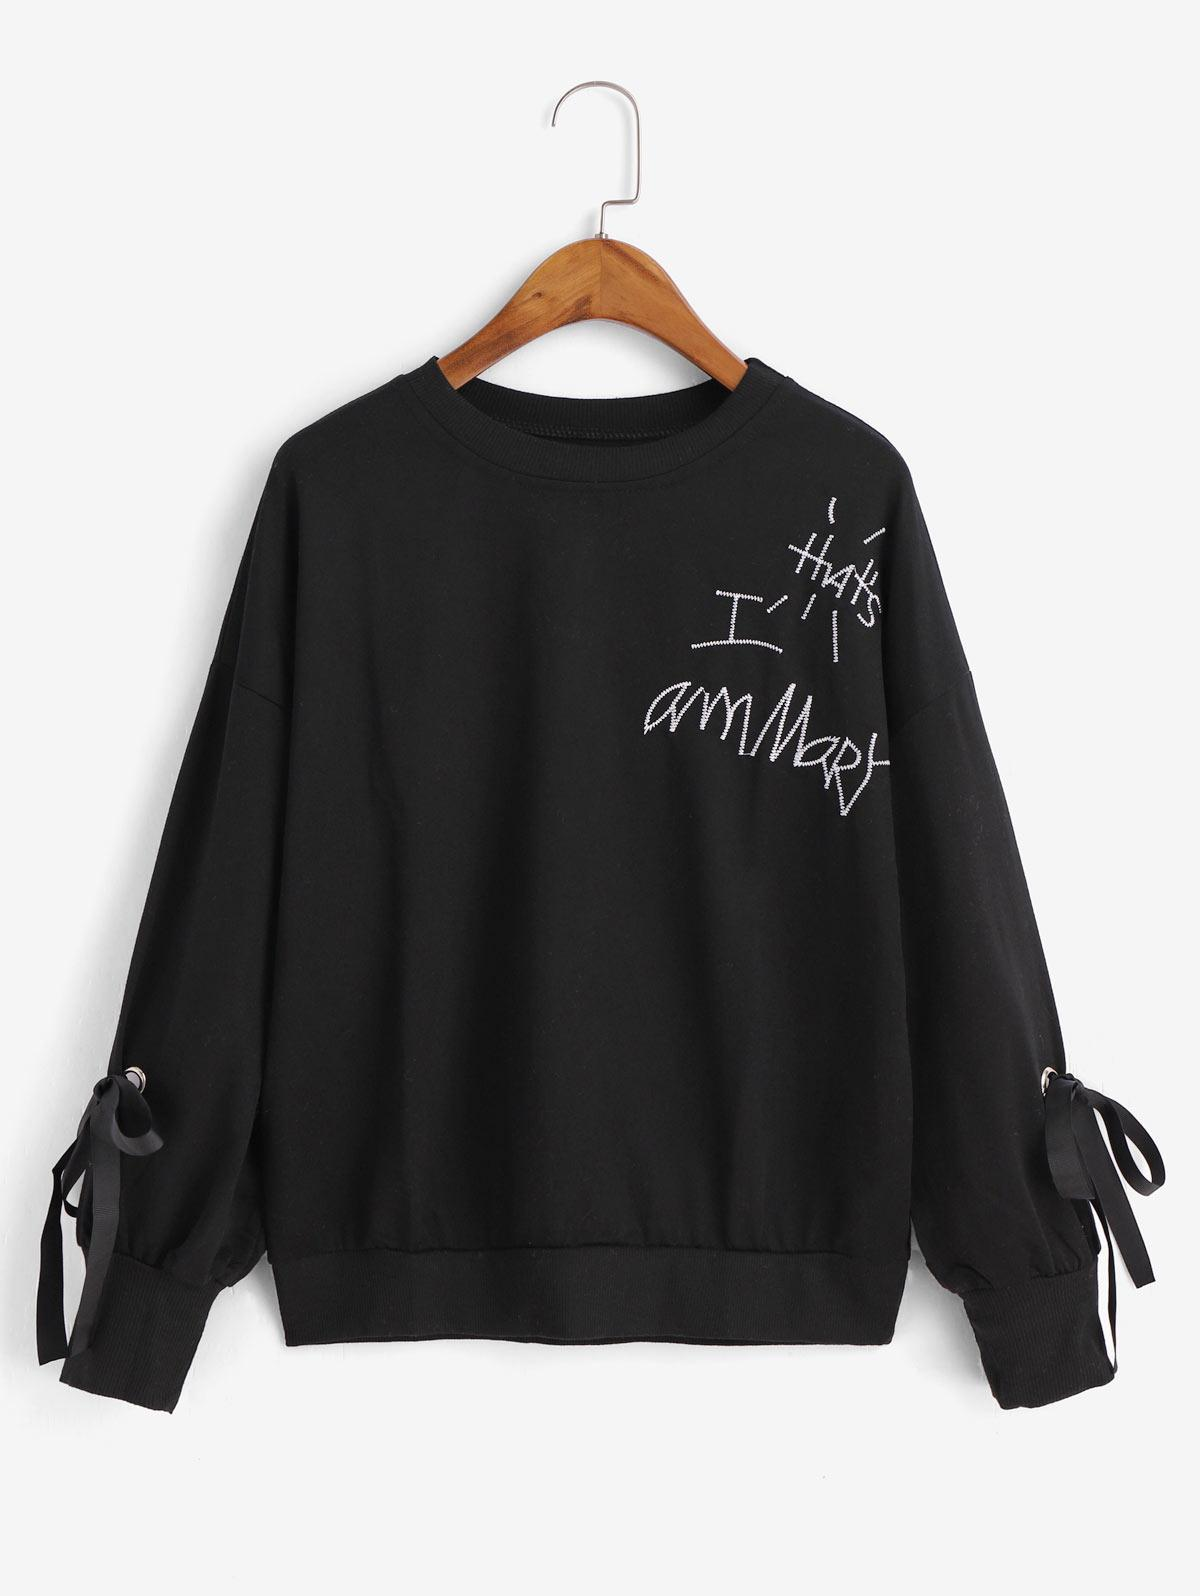 Embroidered Tied Drop Shoulder Sweatshirt